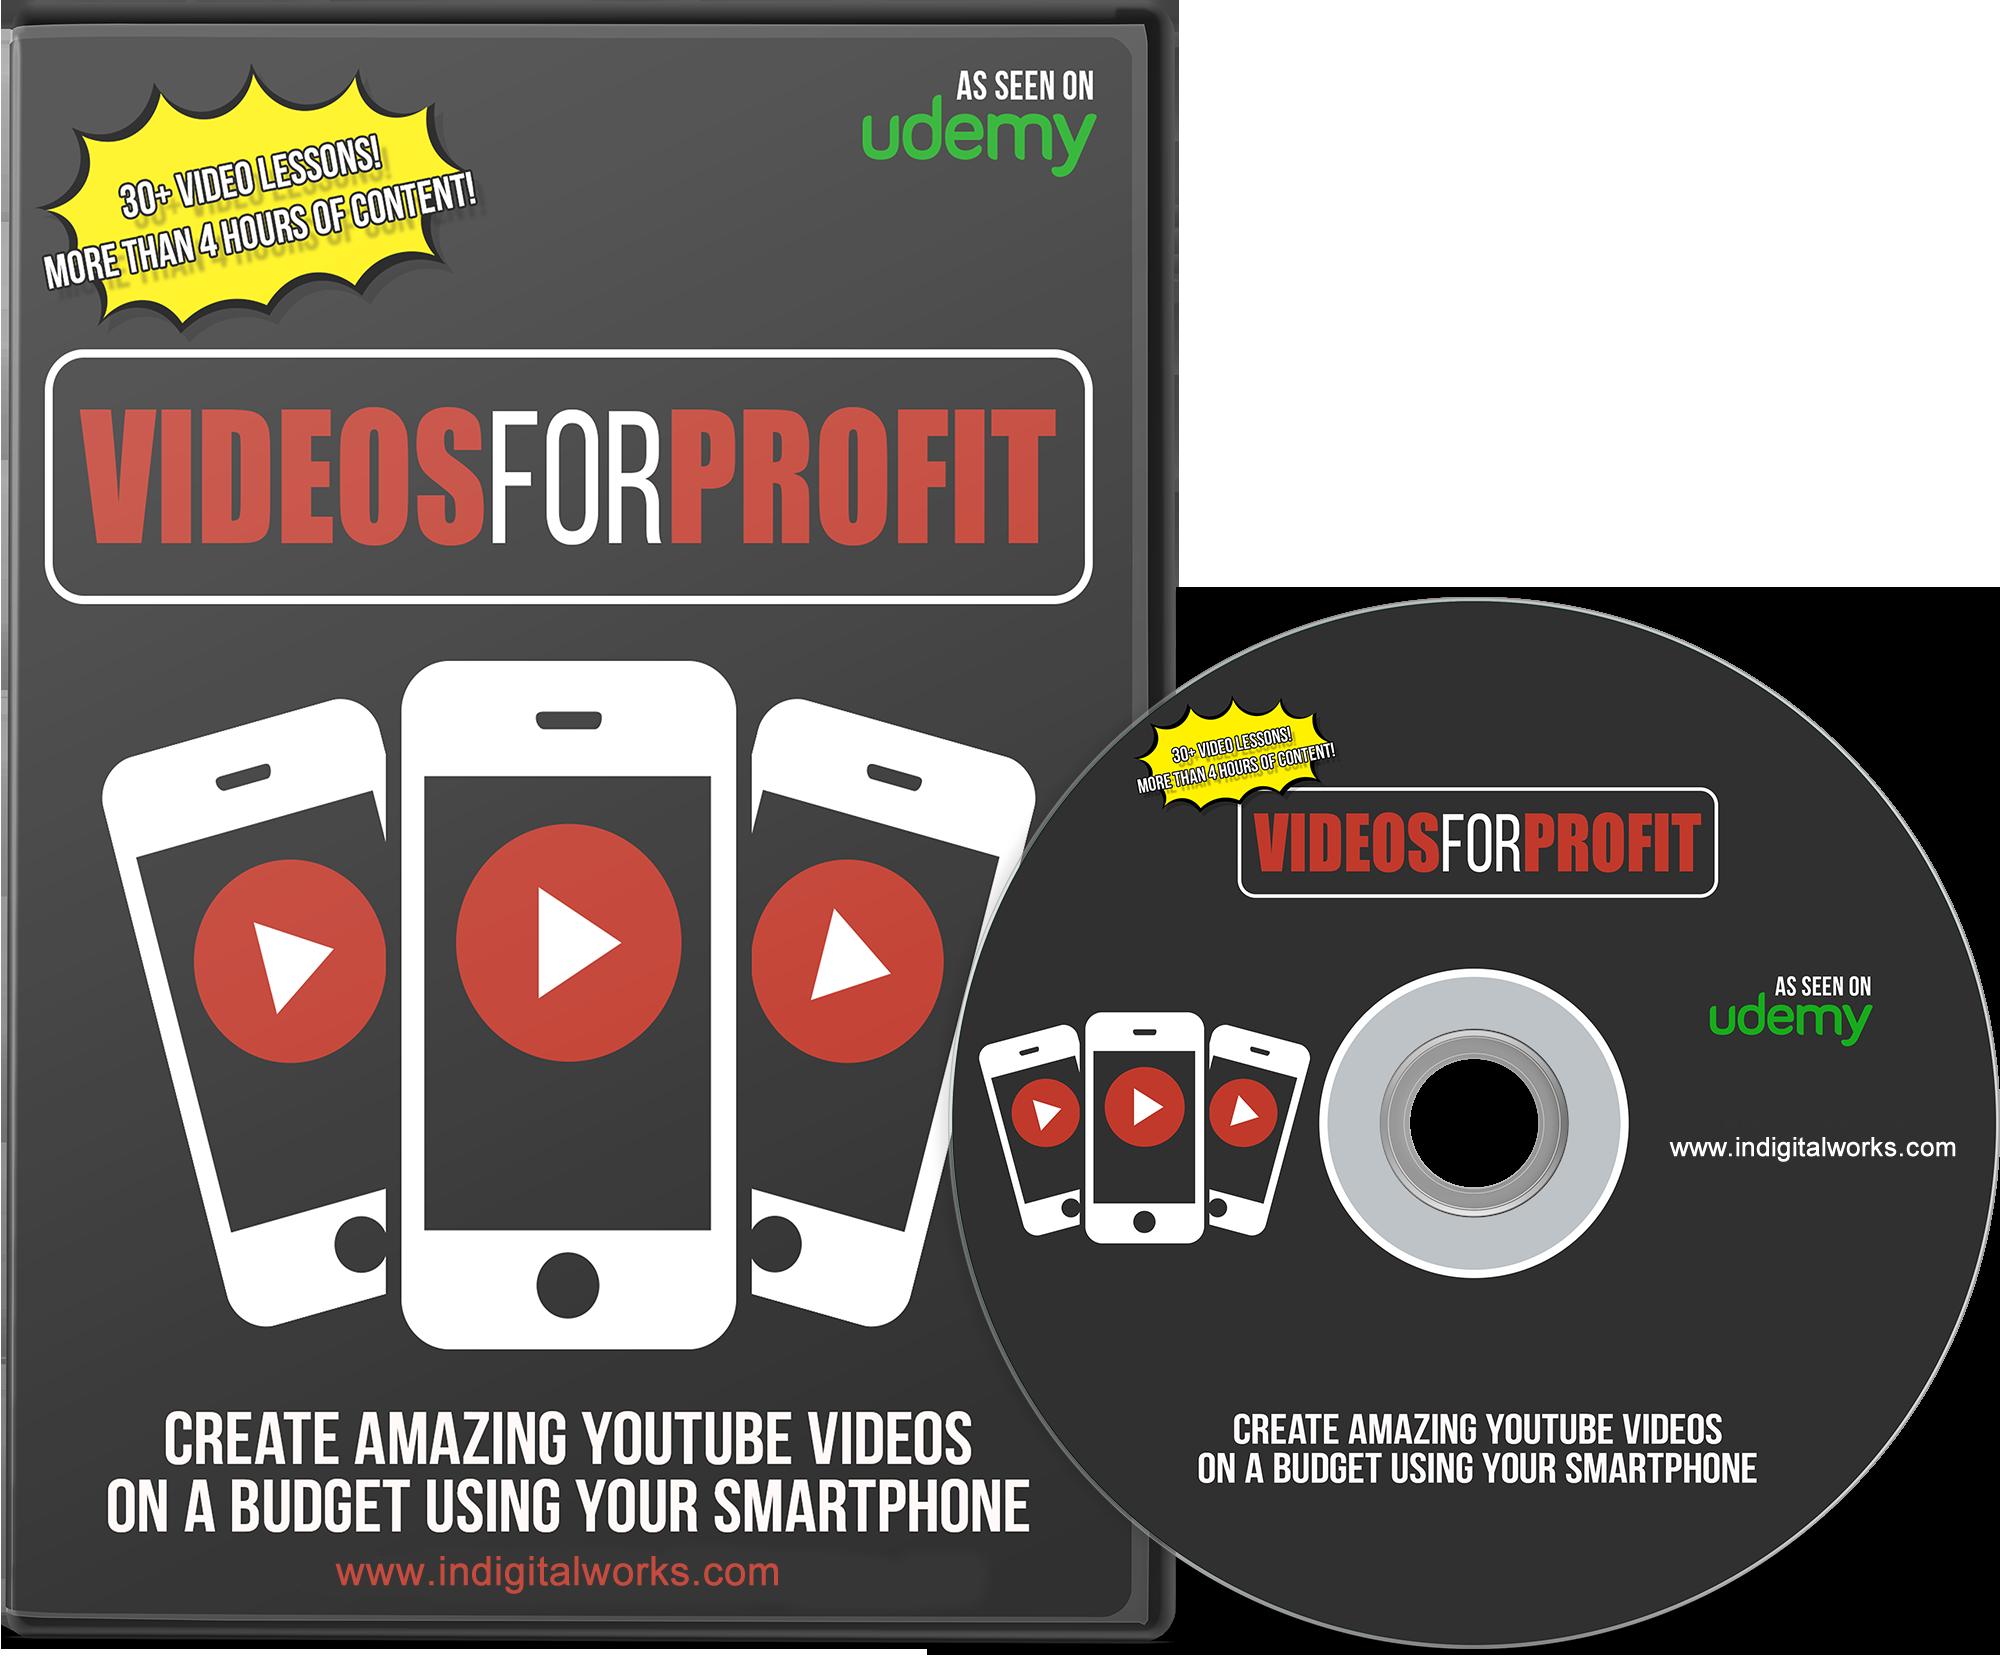 Videos-For-Profit-2020